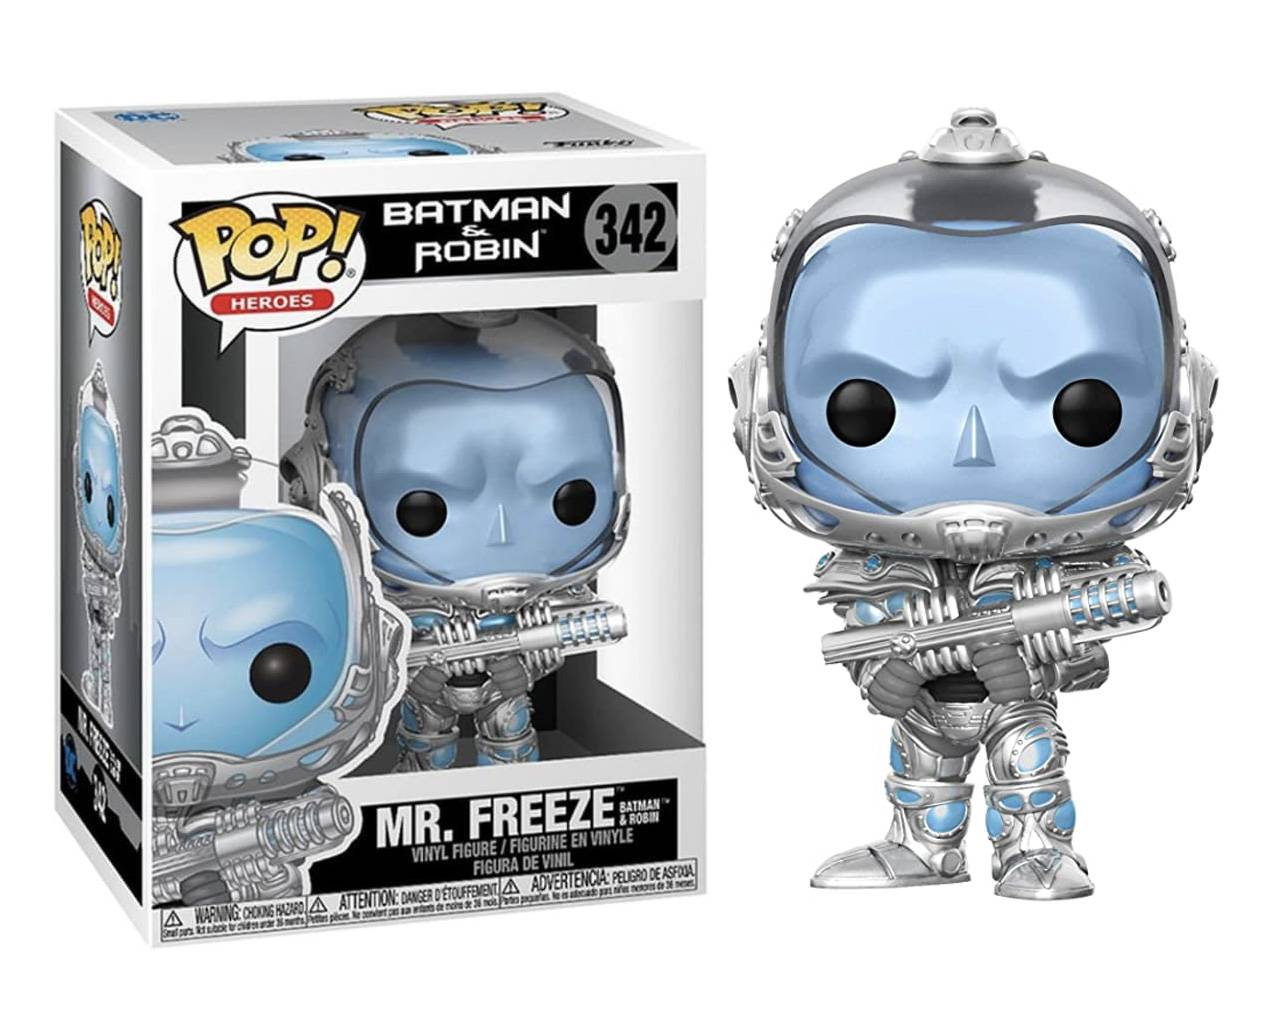 Mr. Freeze (Batman & Robin) Pop! Vinyl